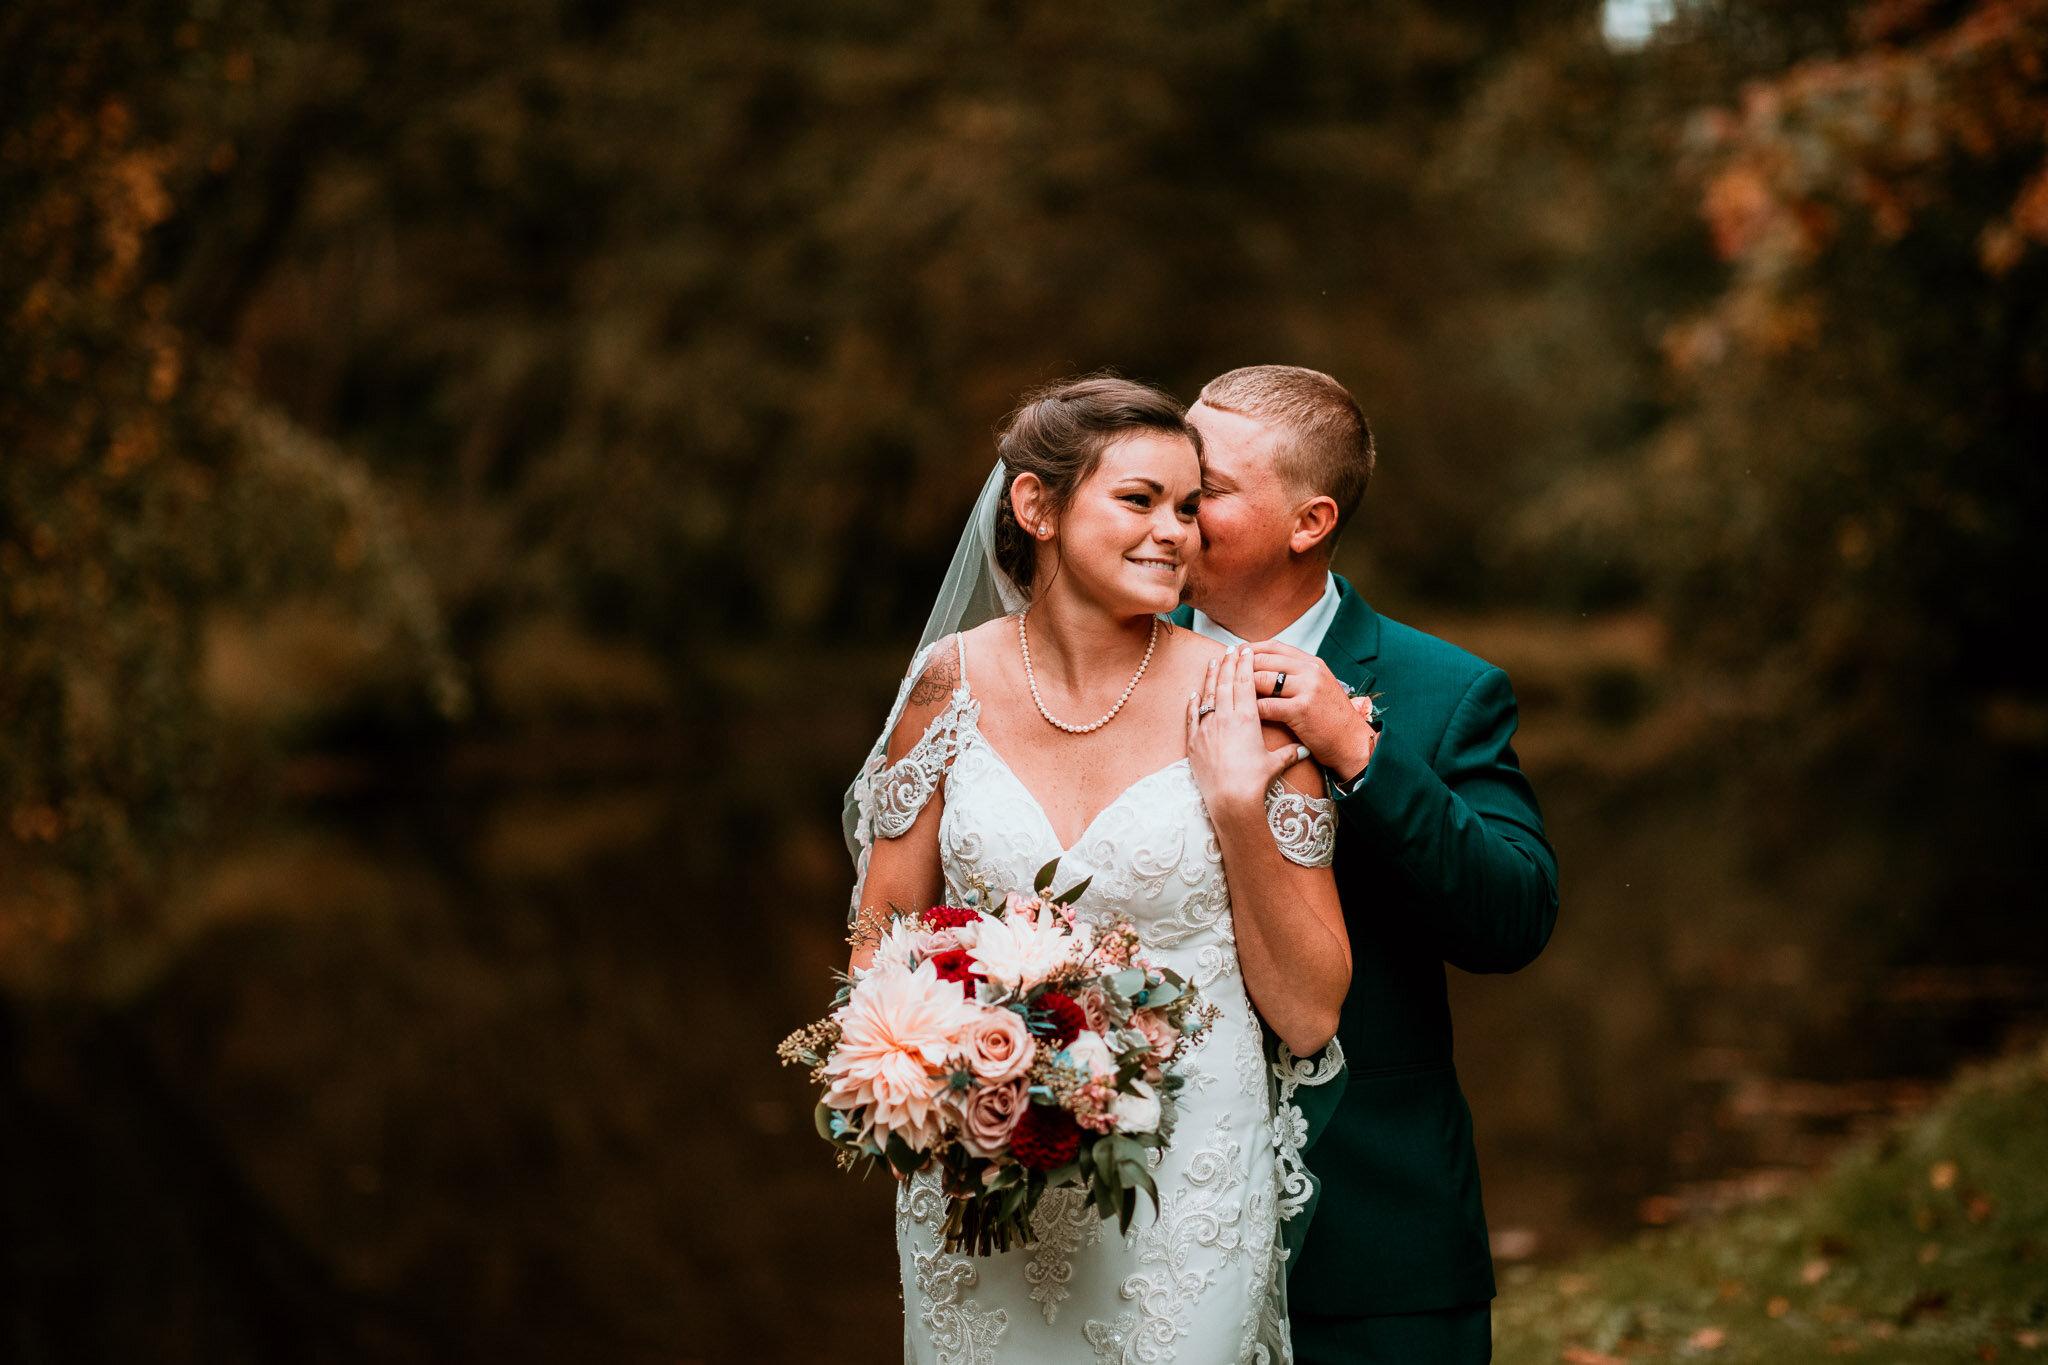 whitewoods-fall-wedding-2466.jpg